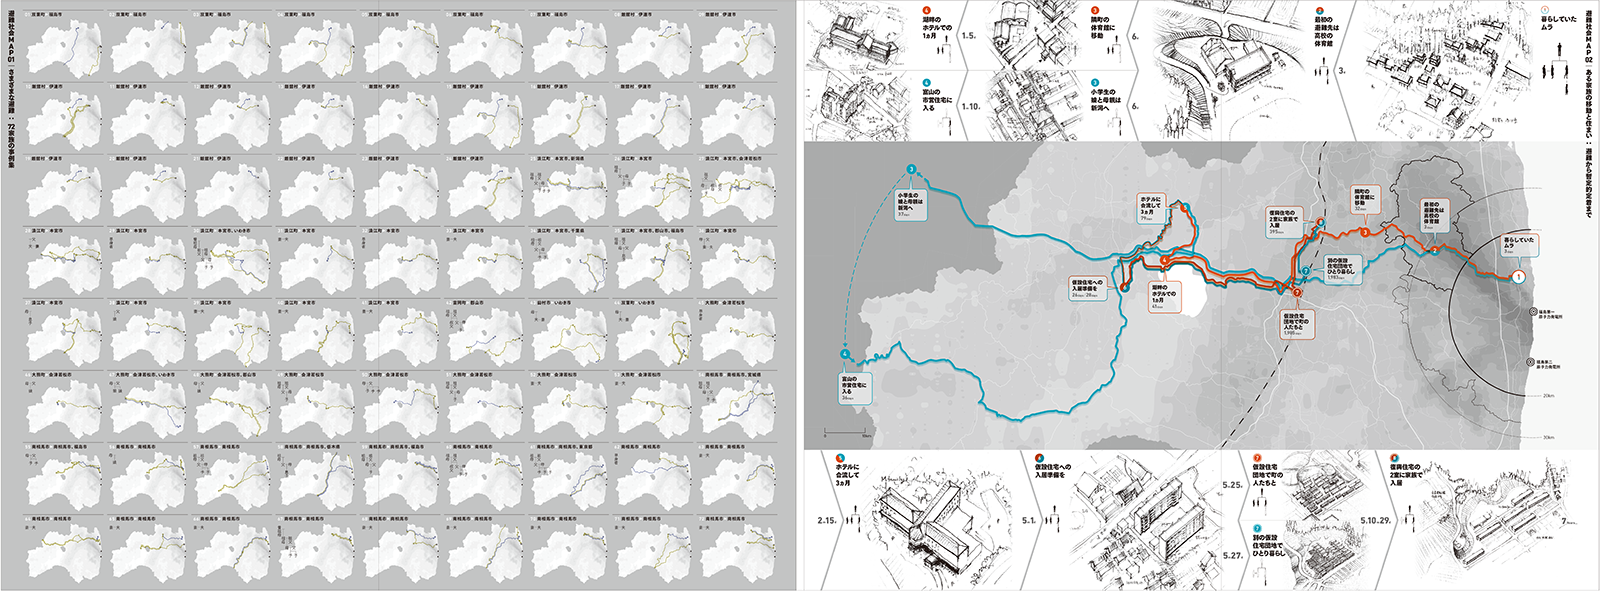 Fukushima_Atlas02_LINES